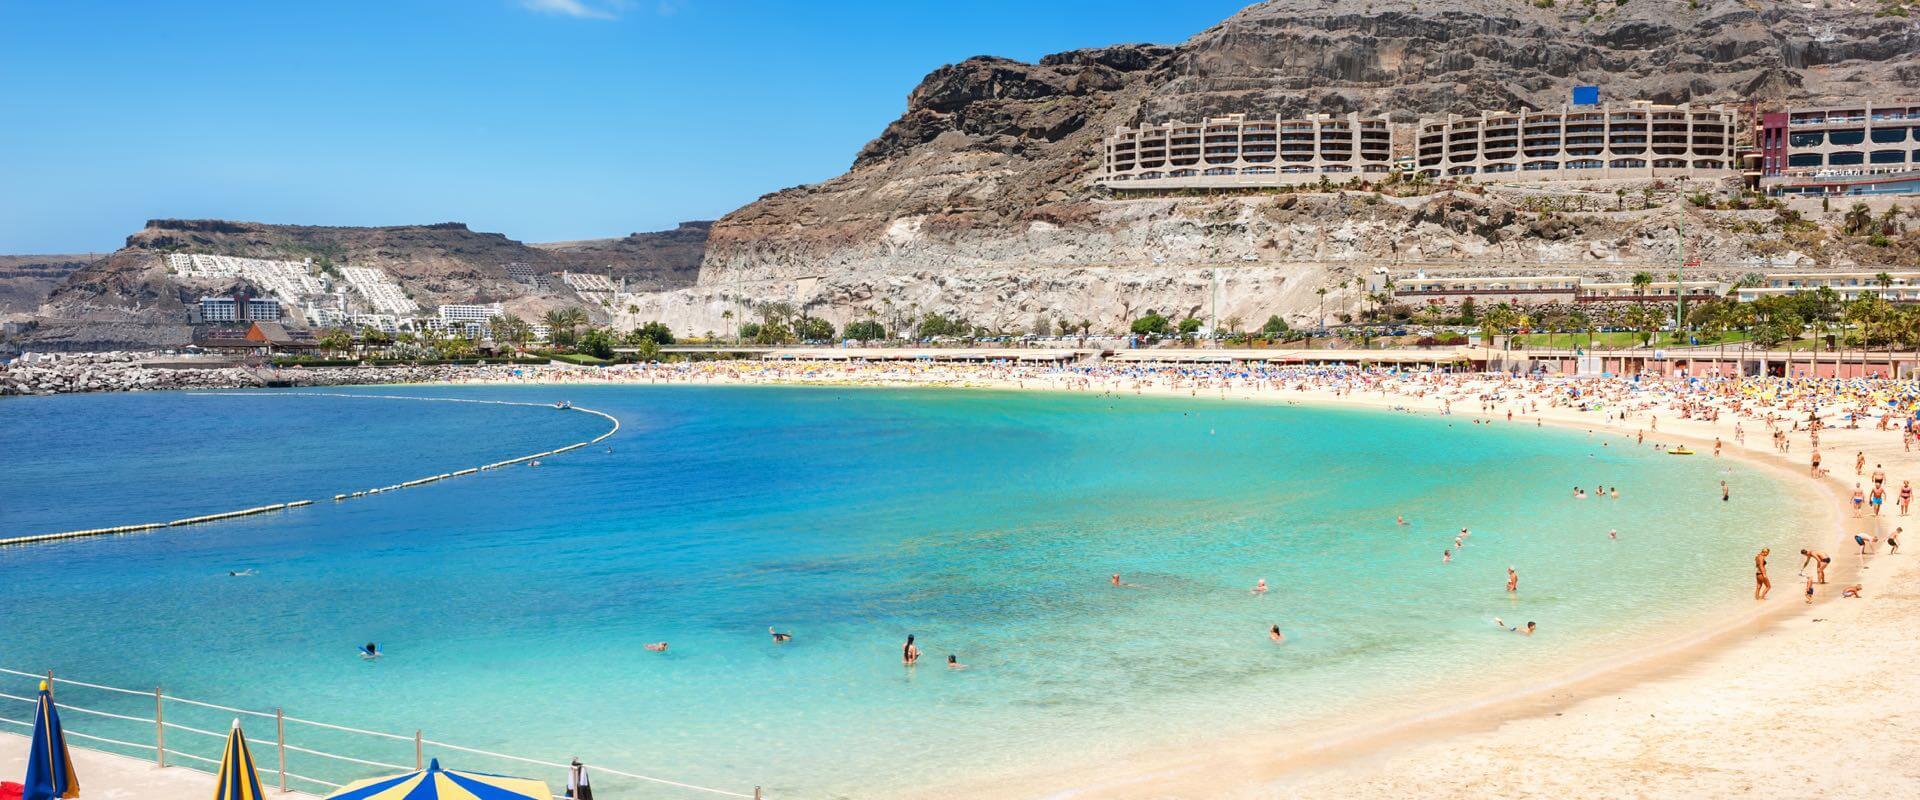 ungarinnen single partnervermittlung gran frauen canaria  Gran Canaria - Singlereisen mit Niveau bei Thomas Cook.